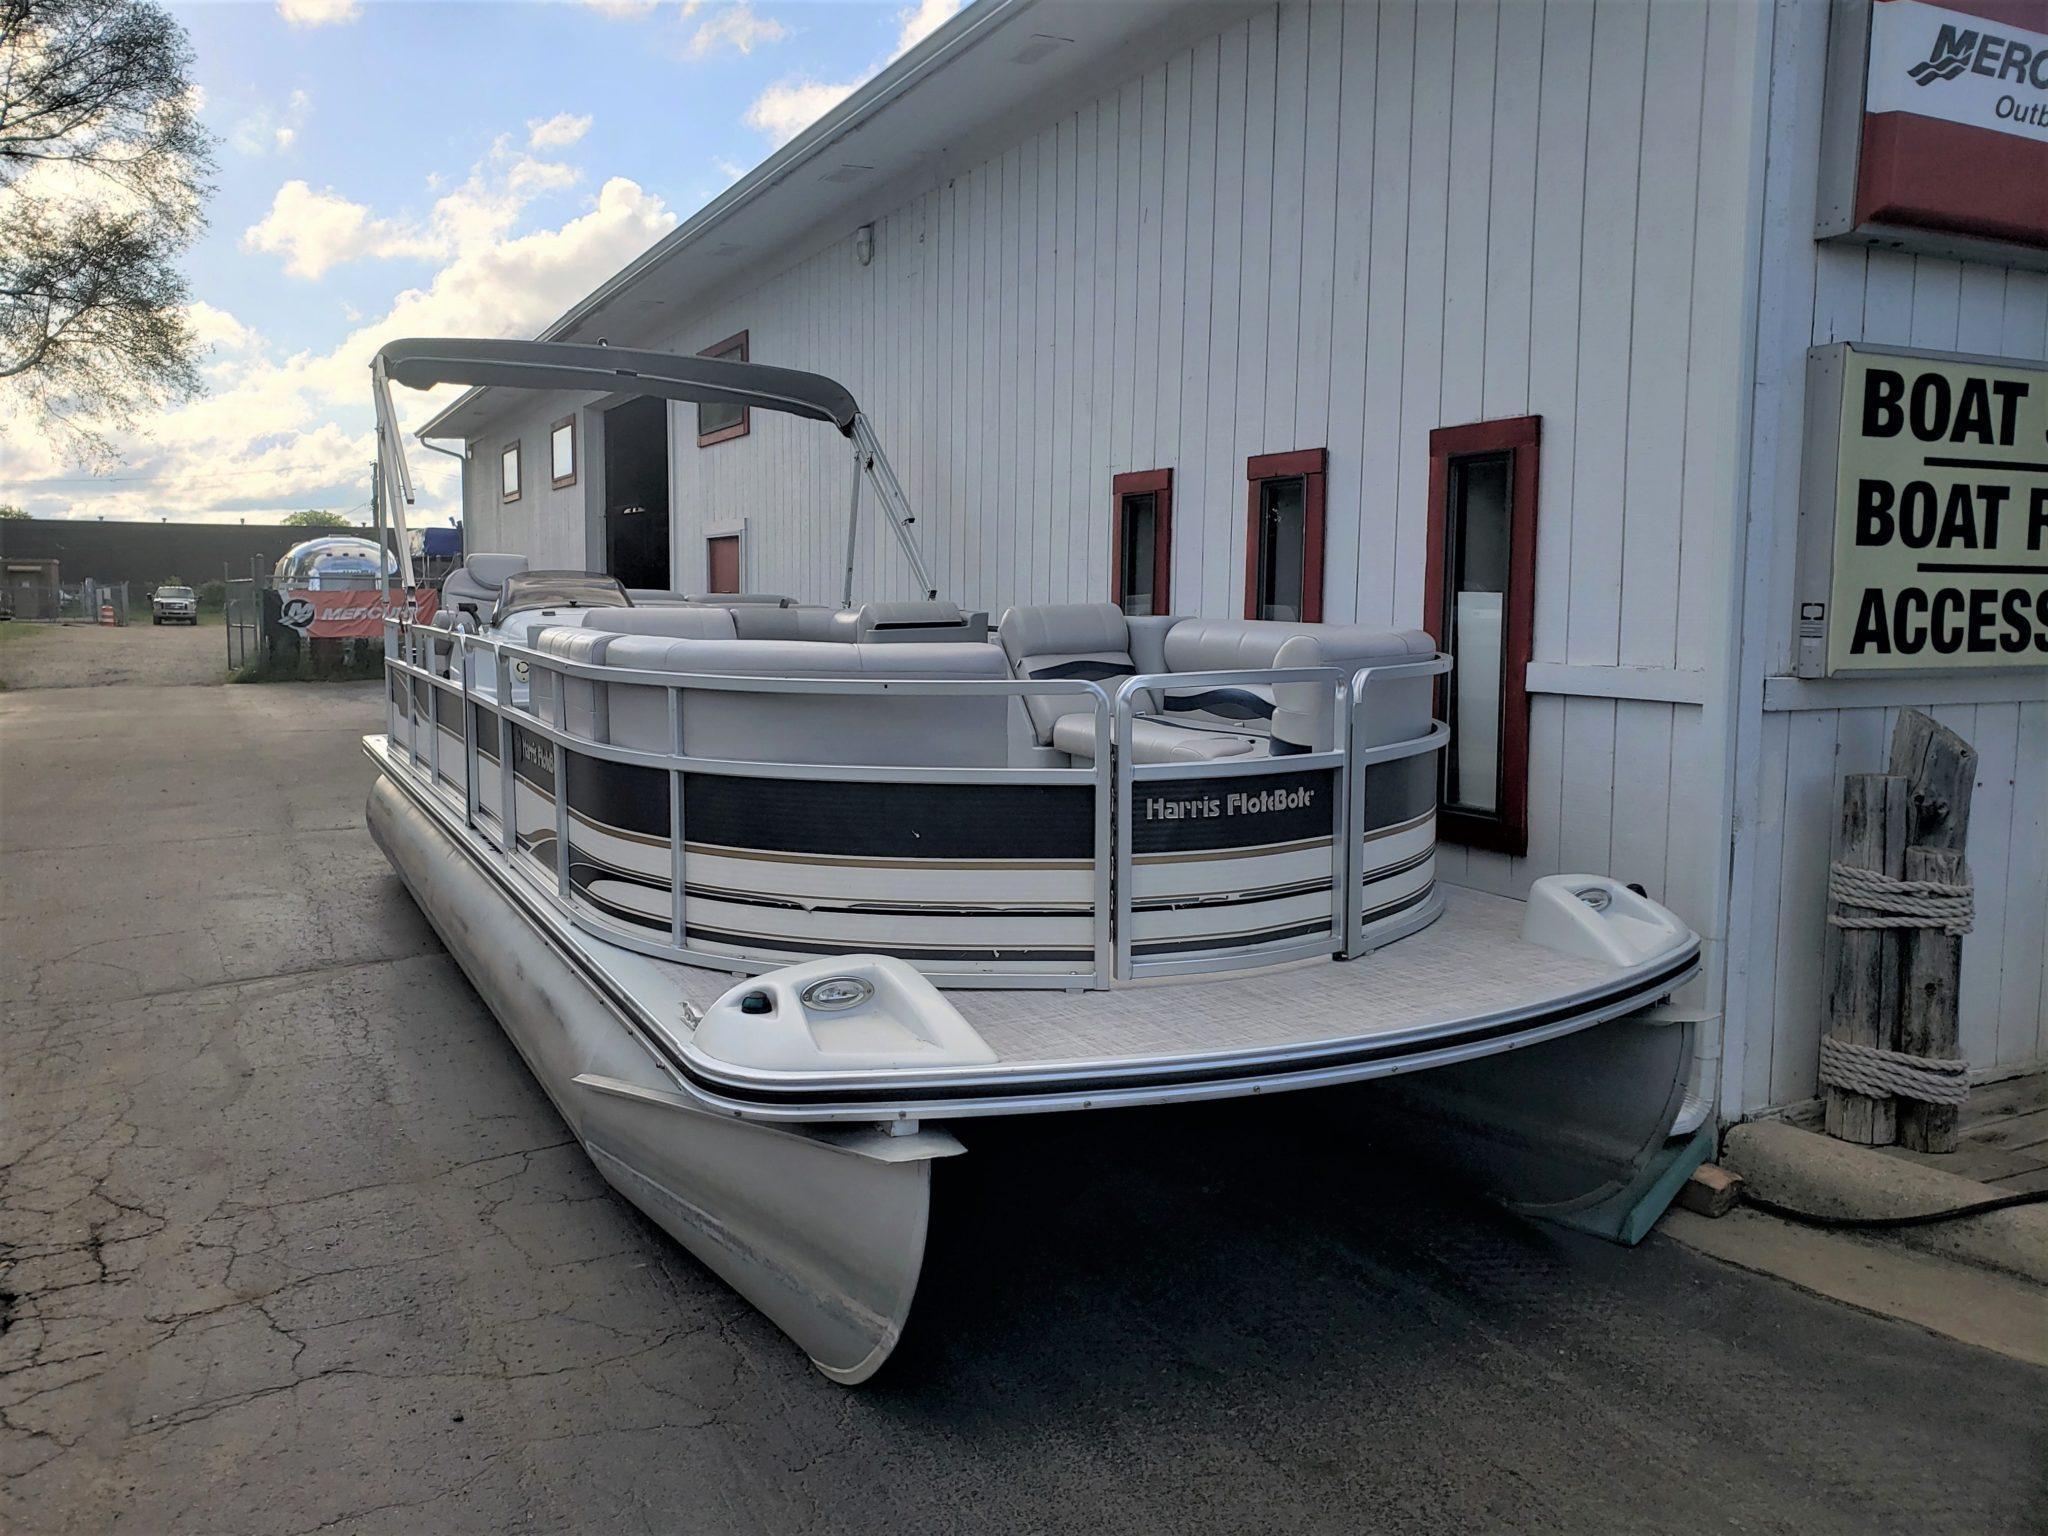 2001 Harris Euro Classic 240 Pontoon Boat